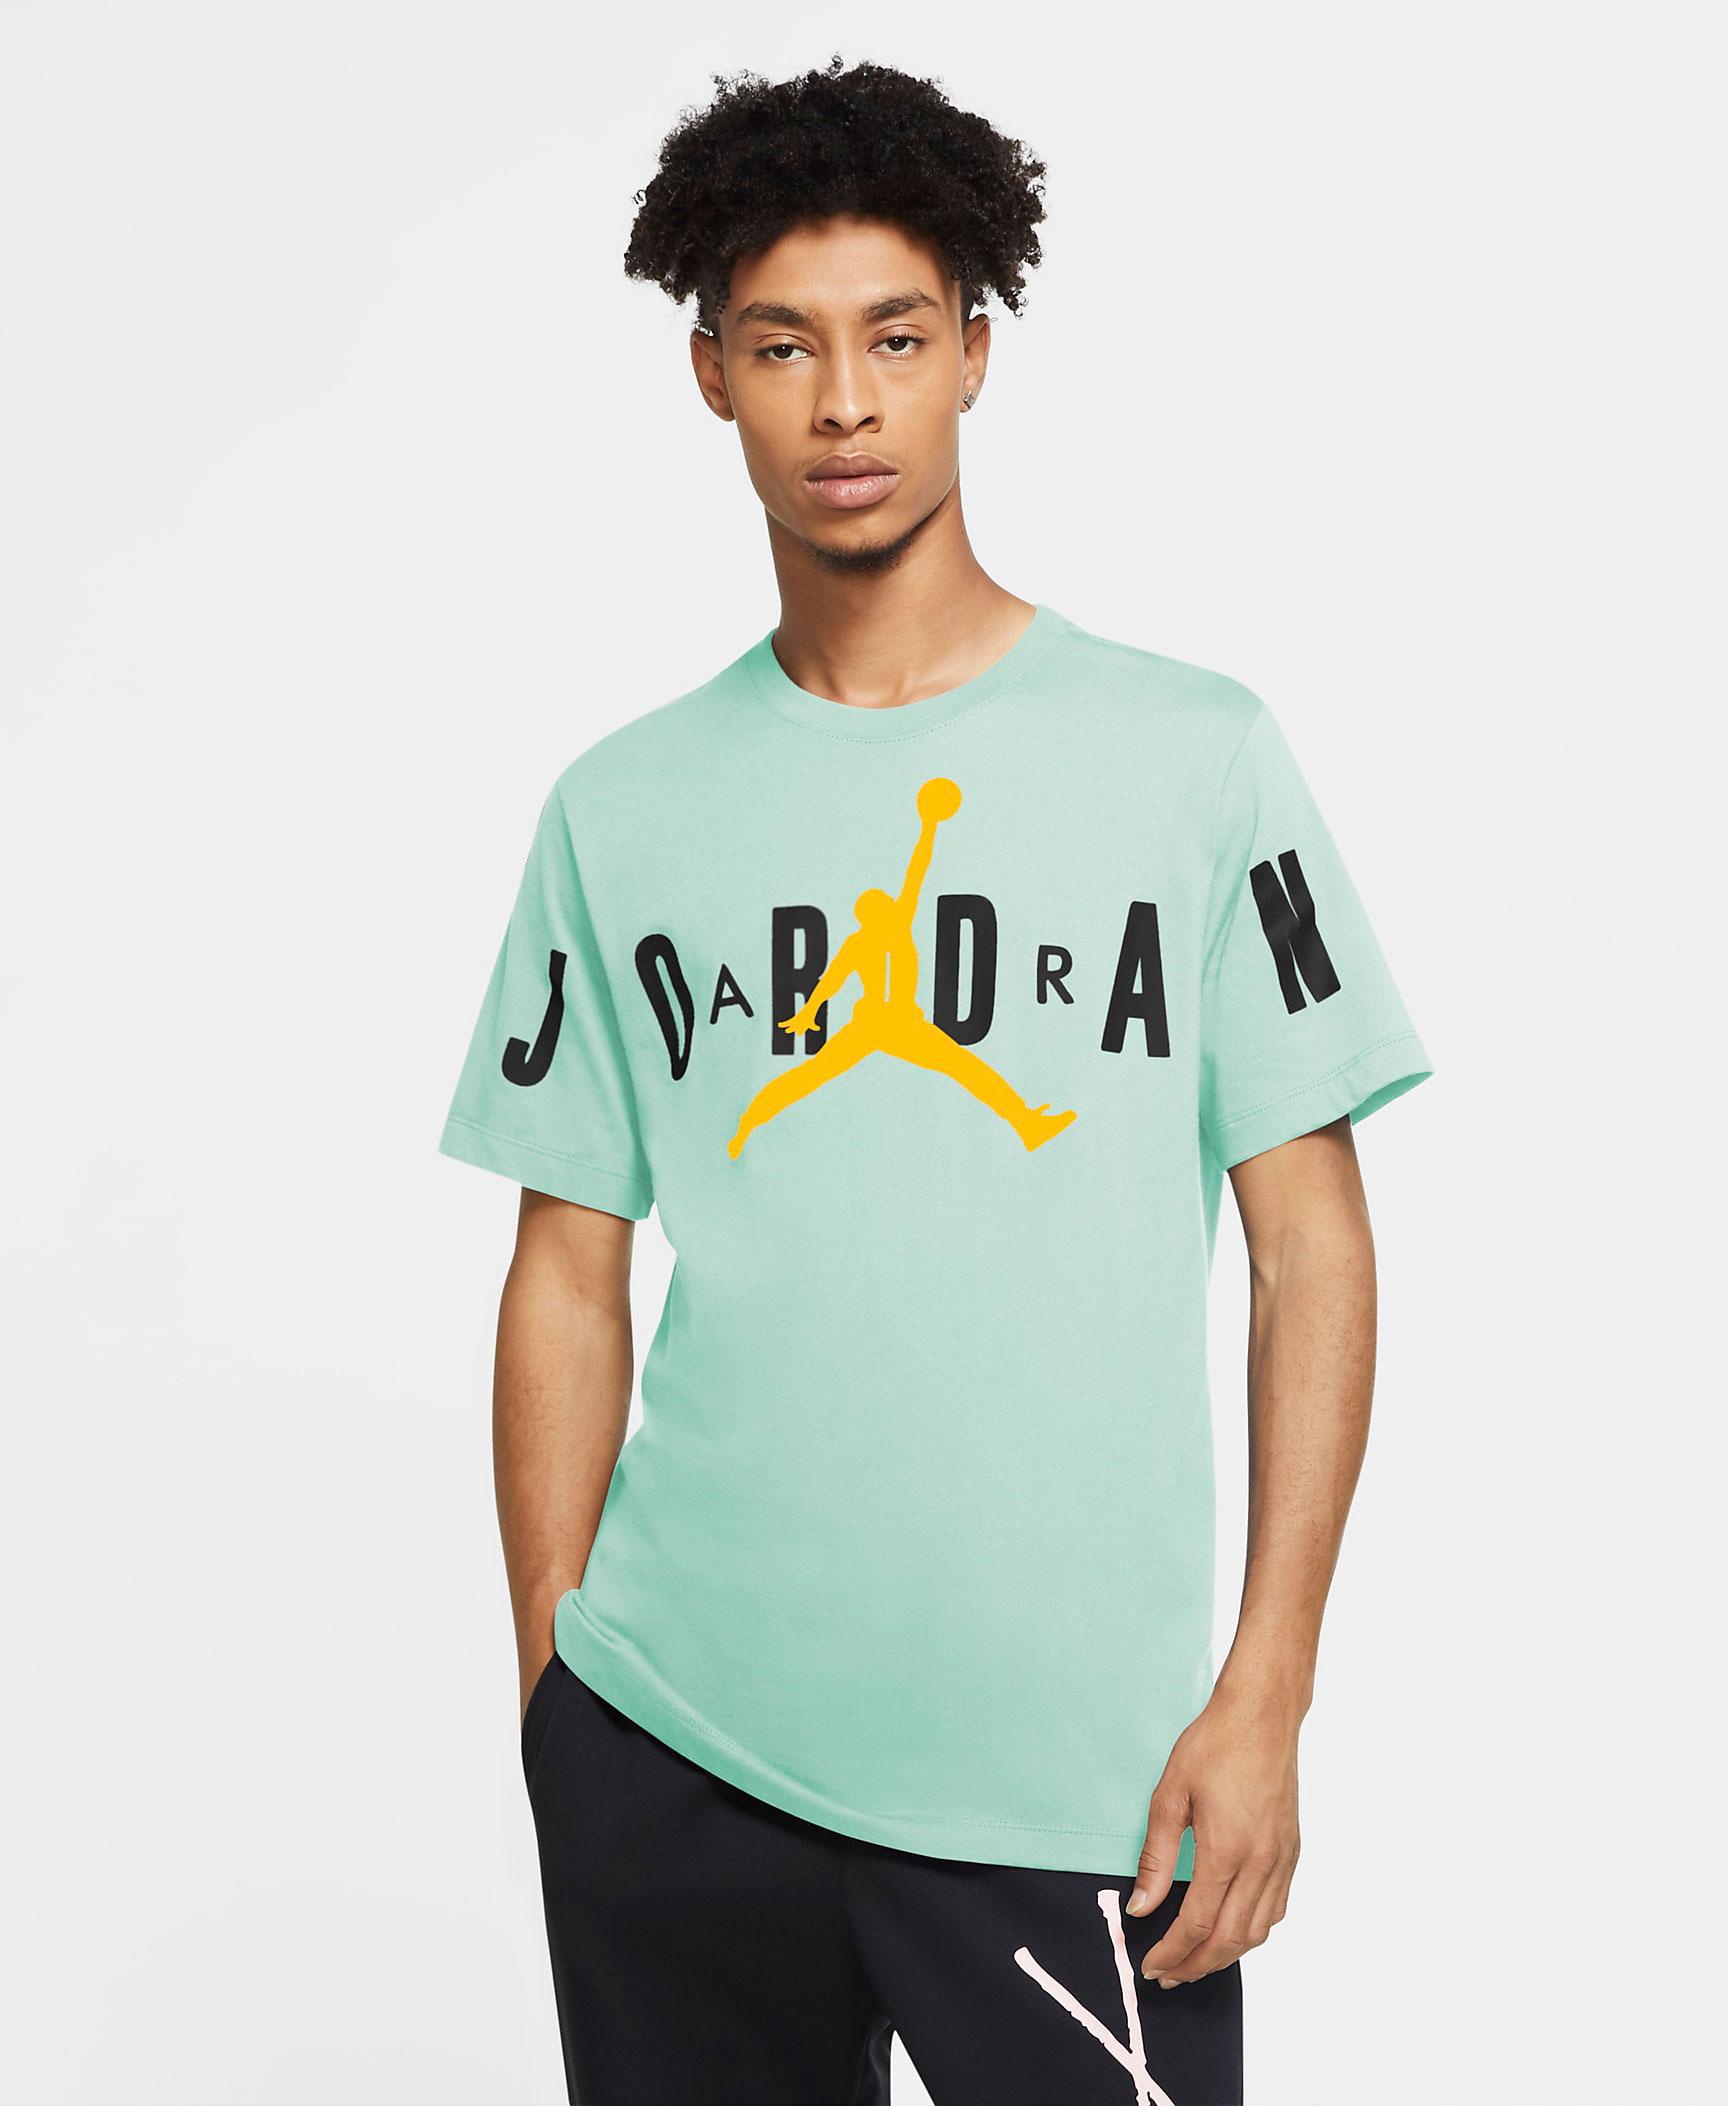 jordan-12-university-gold-shirt-match-4